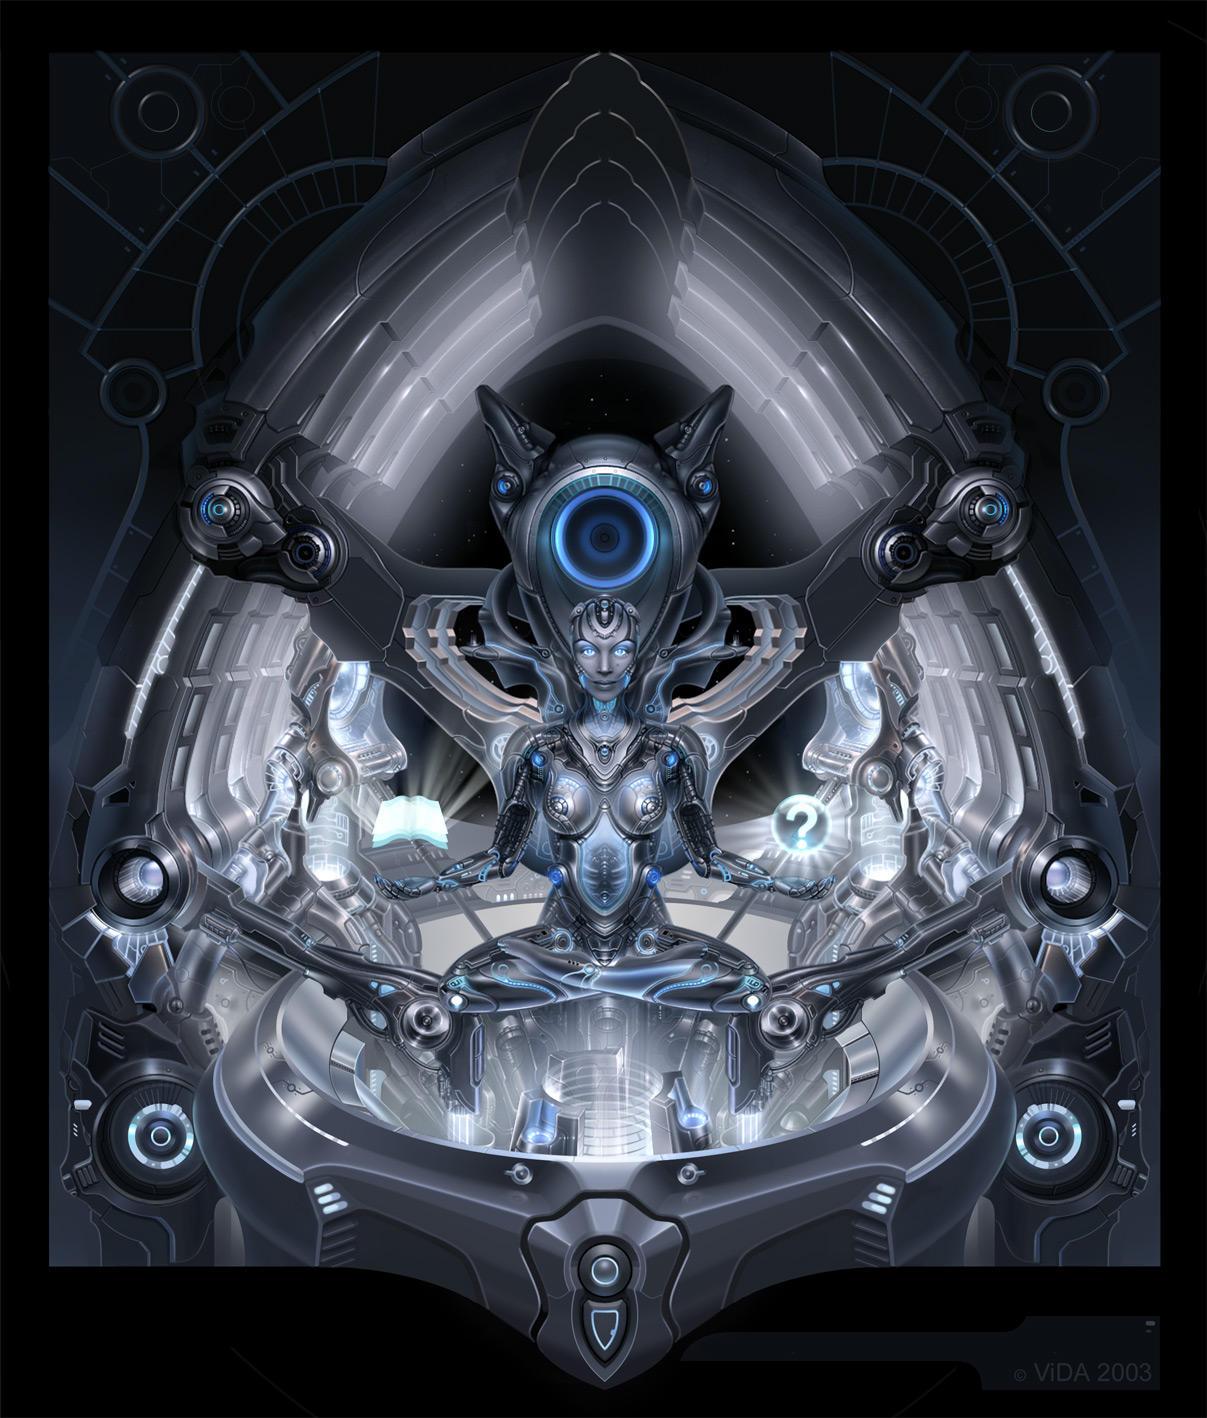 Power of Knowledge-Paradox by vlda